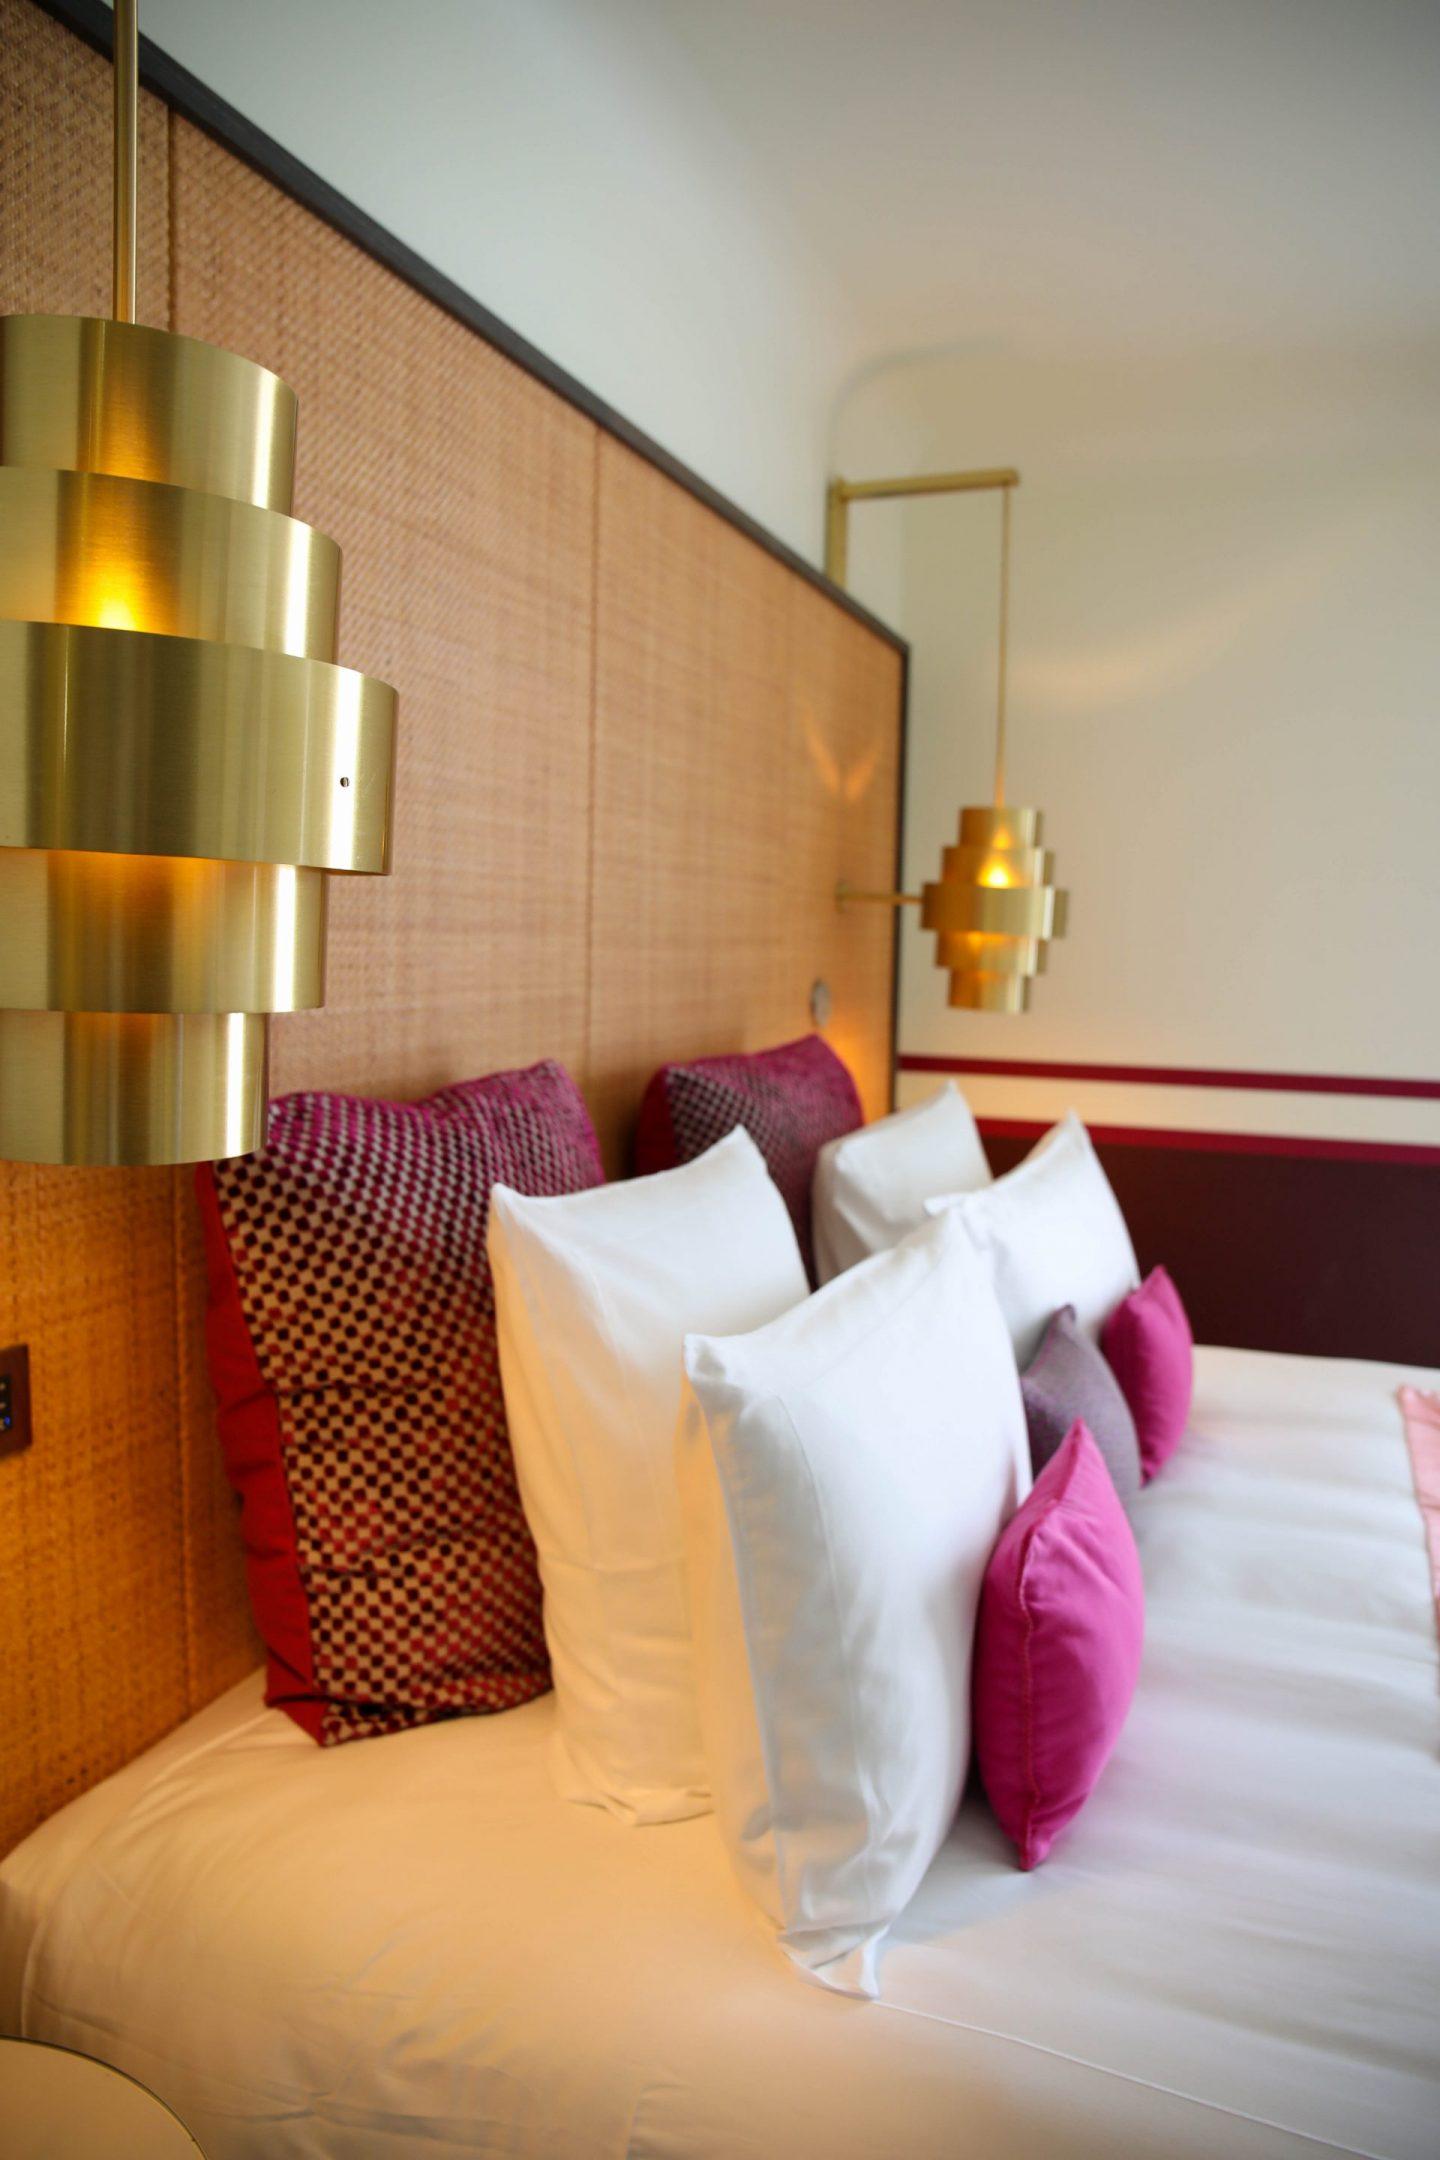 Hotel De Paris St Tropez Preferred Hotels Chanel Dior Des Lices